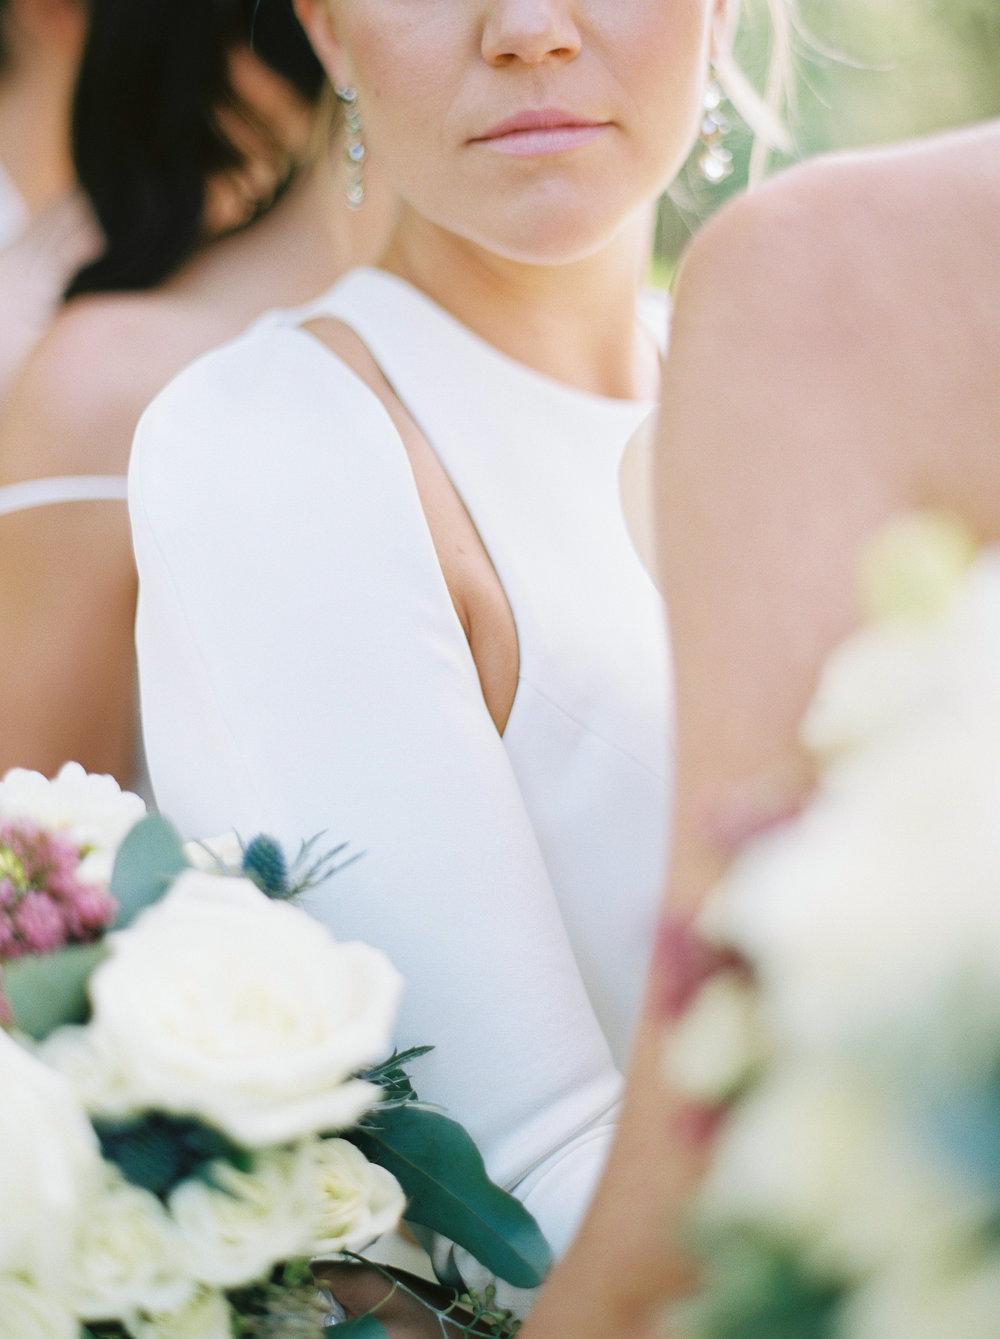 0161-Geneva-Ian-Wedding-Toronto Golf Club-When He Found Her-TorontoPhotographer.jpg